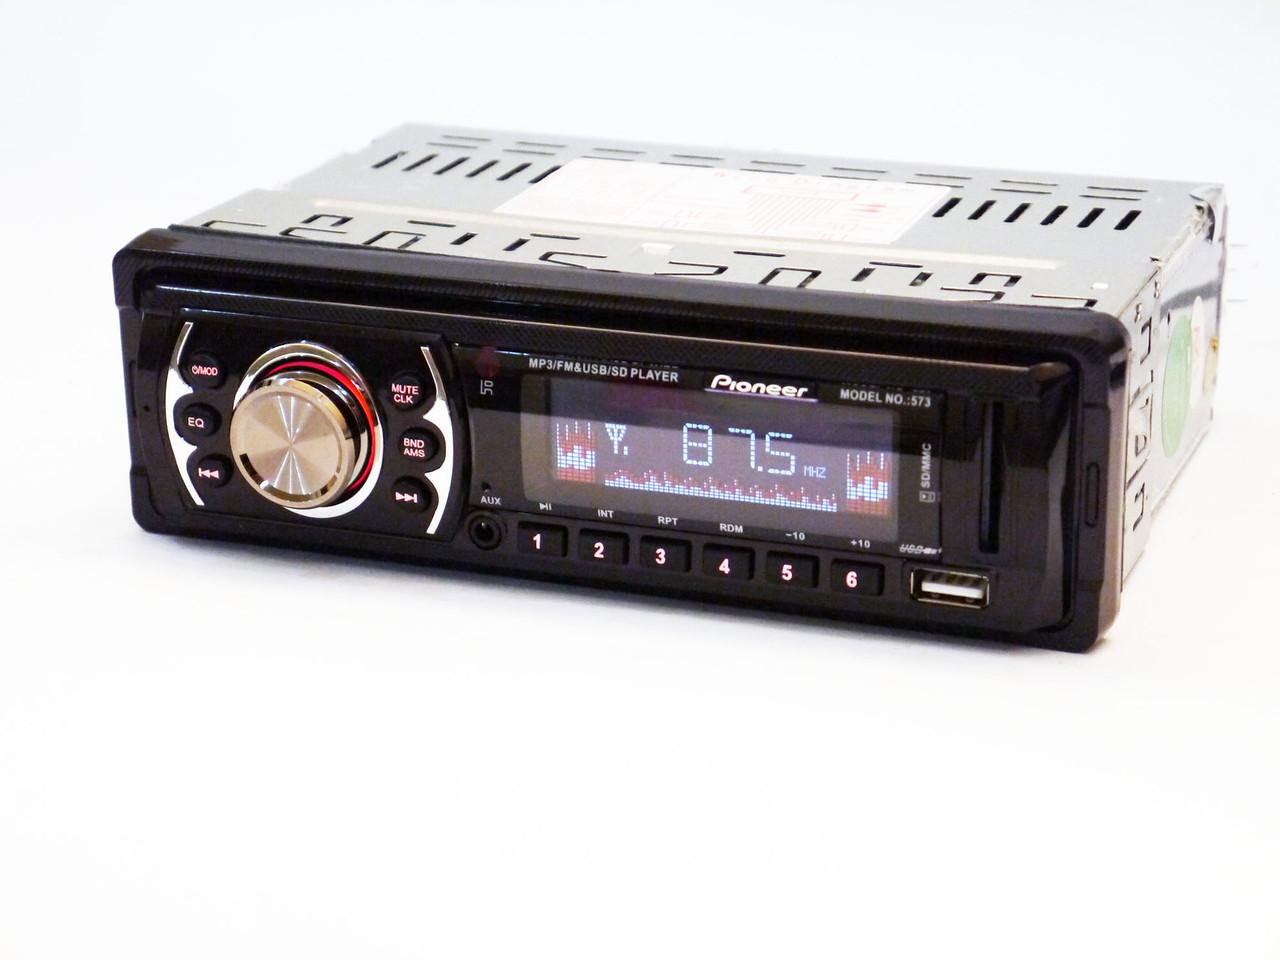 Автомагнитола Pioneer 573 - MP3 Player, FM, USB, SD, AUX